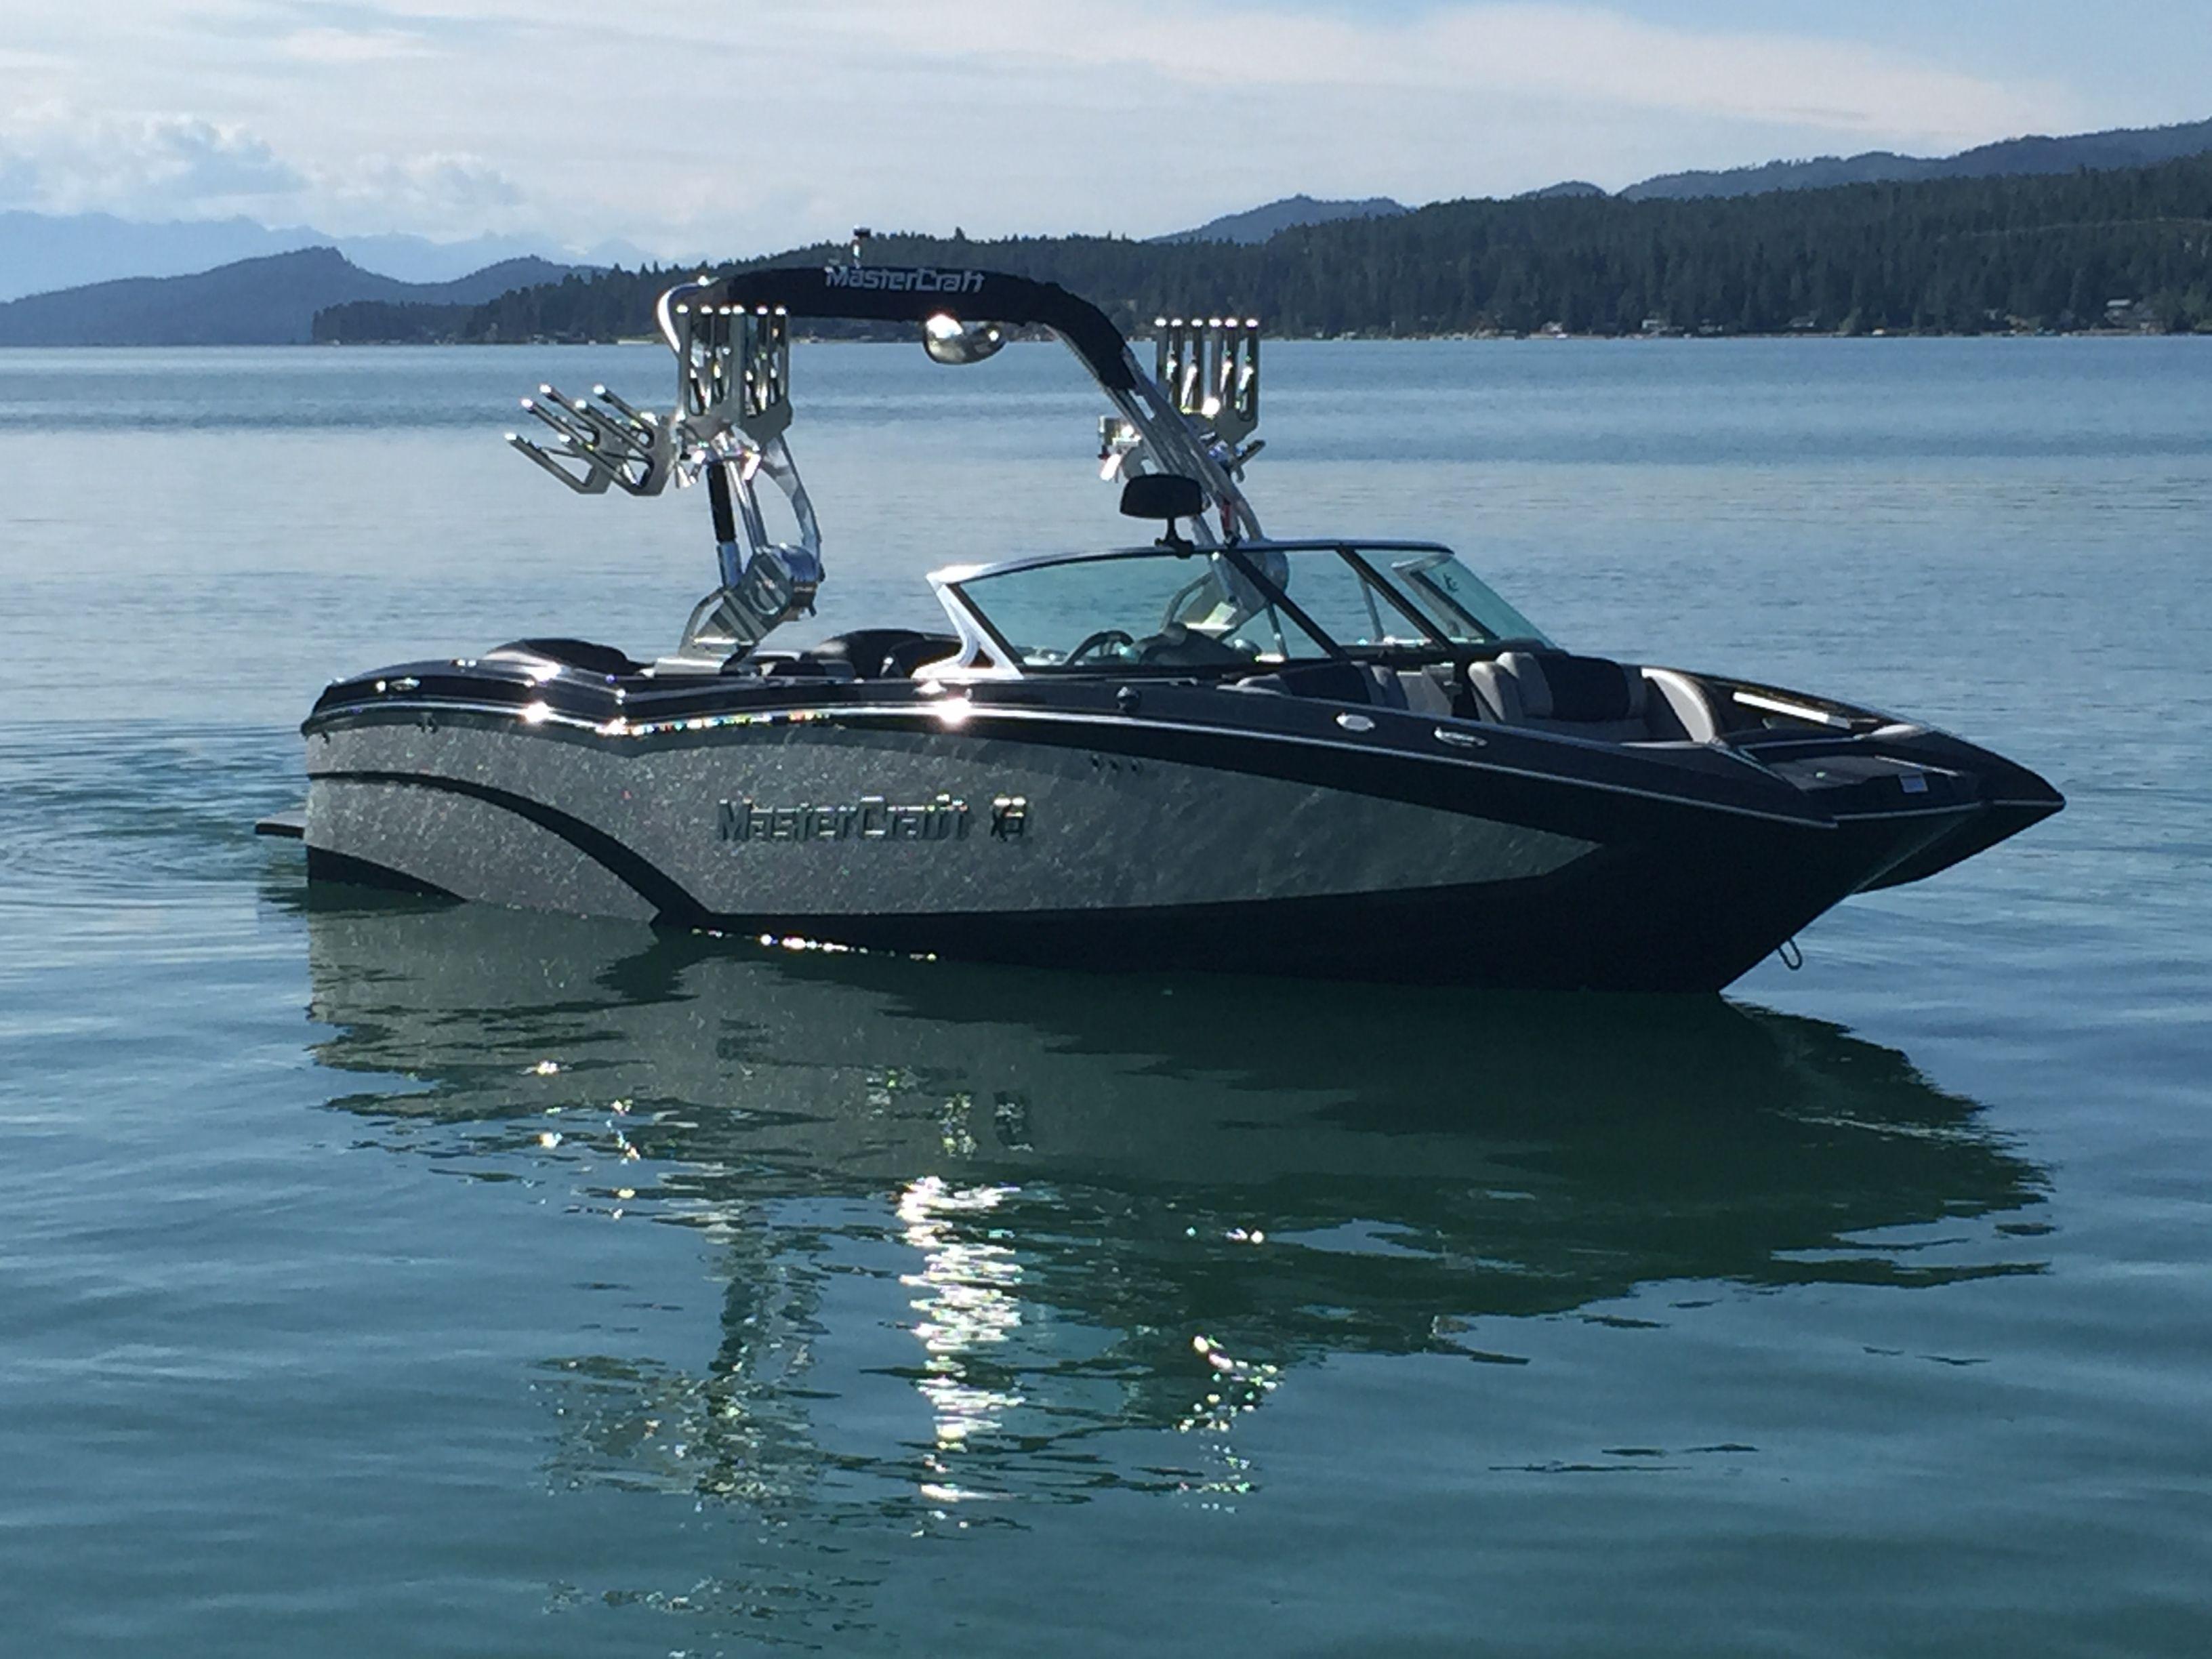 2015 Mastercraft X 23 Midnight Black Silver Flake Flathead Lake Mt Wakeboard Boats Mastercraft Boat Boat